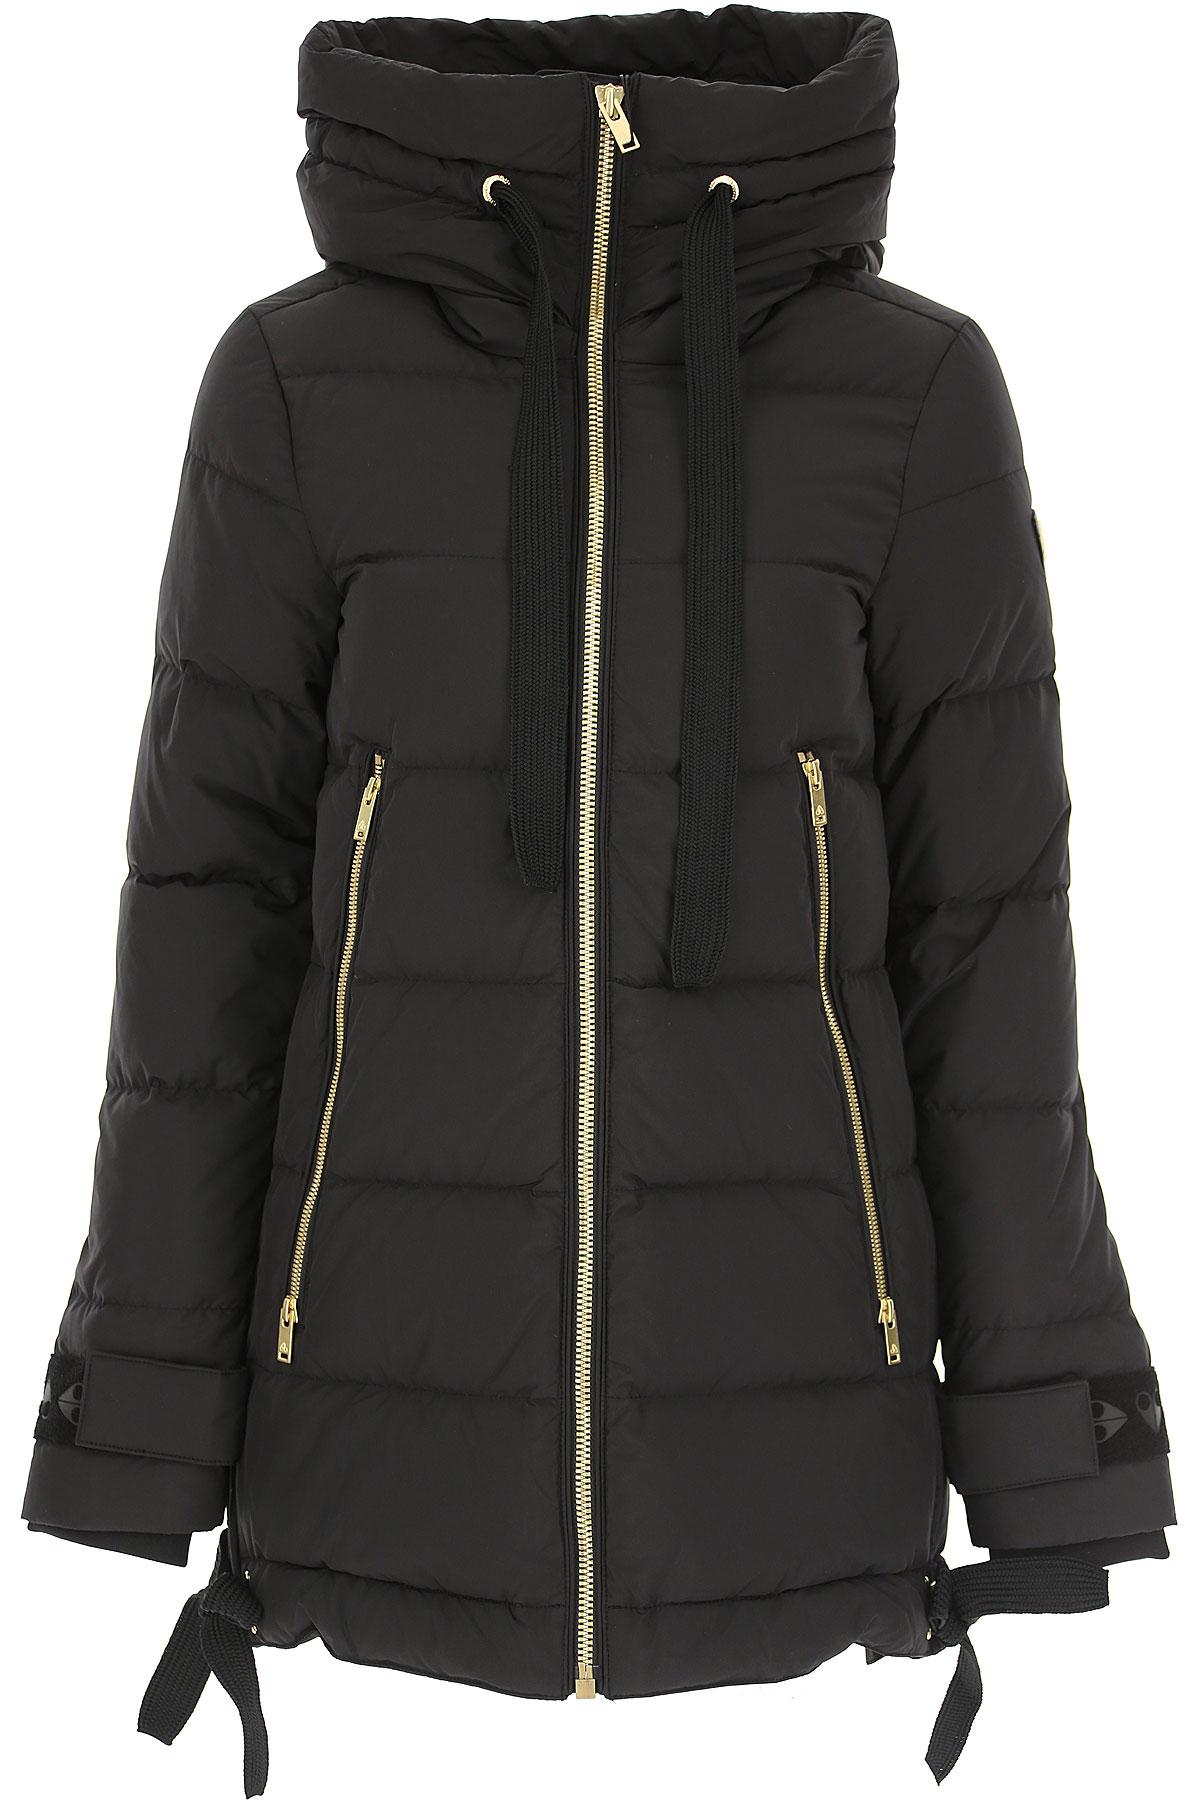 Moose Knuckles Down Jacket for Women, Puffer Ski Jacket On Sale, Black, Down, 2019, 2 4 6